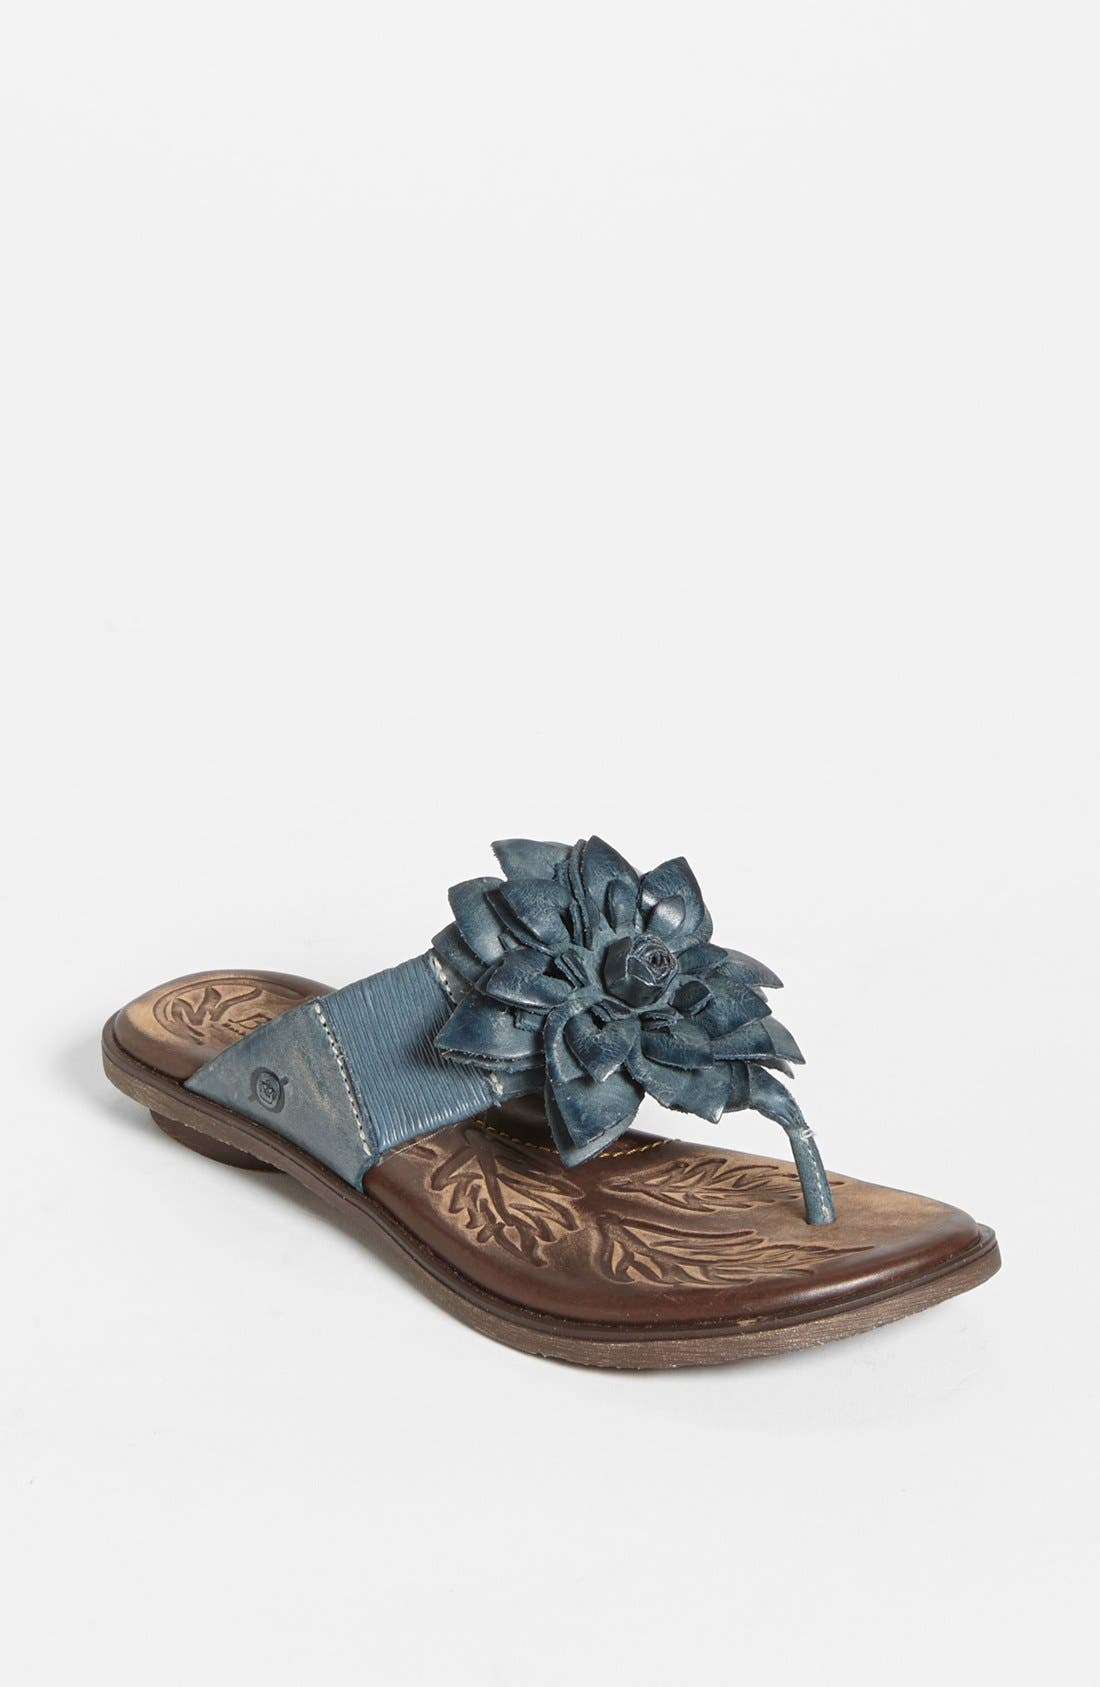 Alternate Image 1 Selected - Børn 'Astrid' Sandal (Special Purchase)